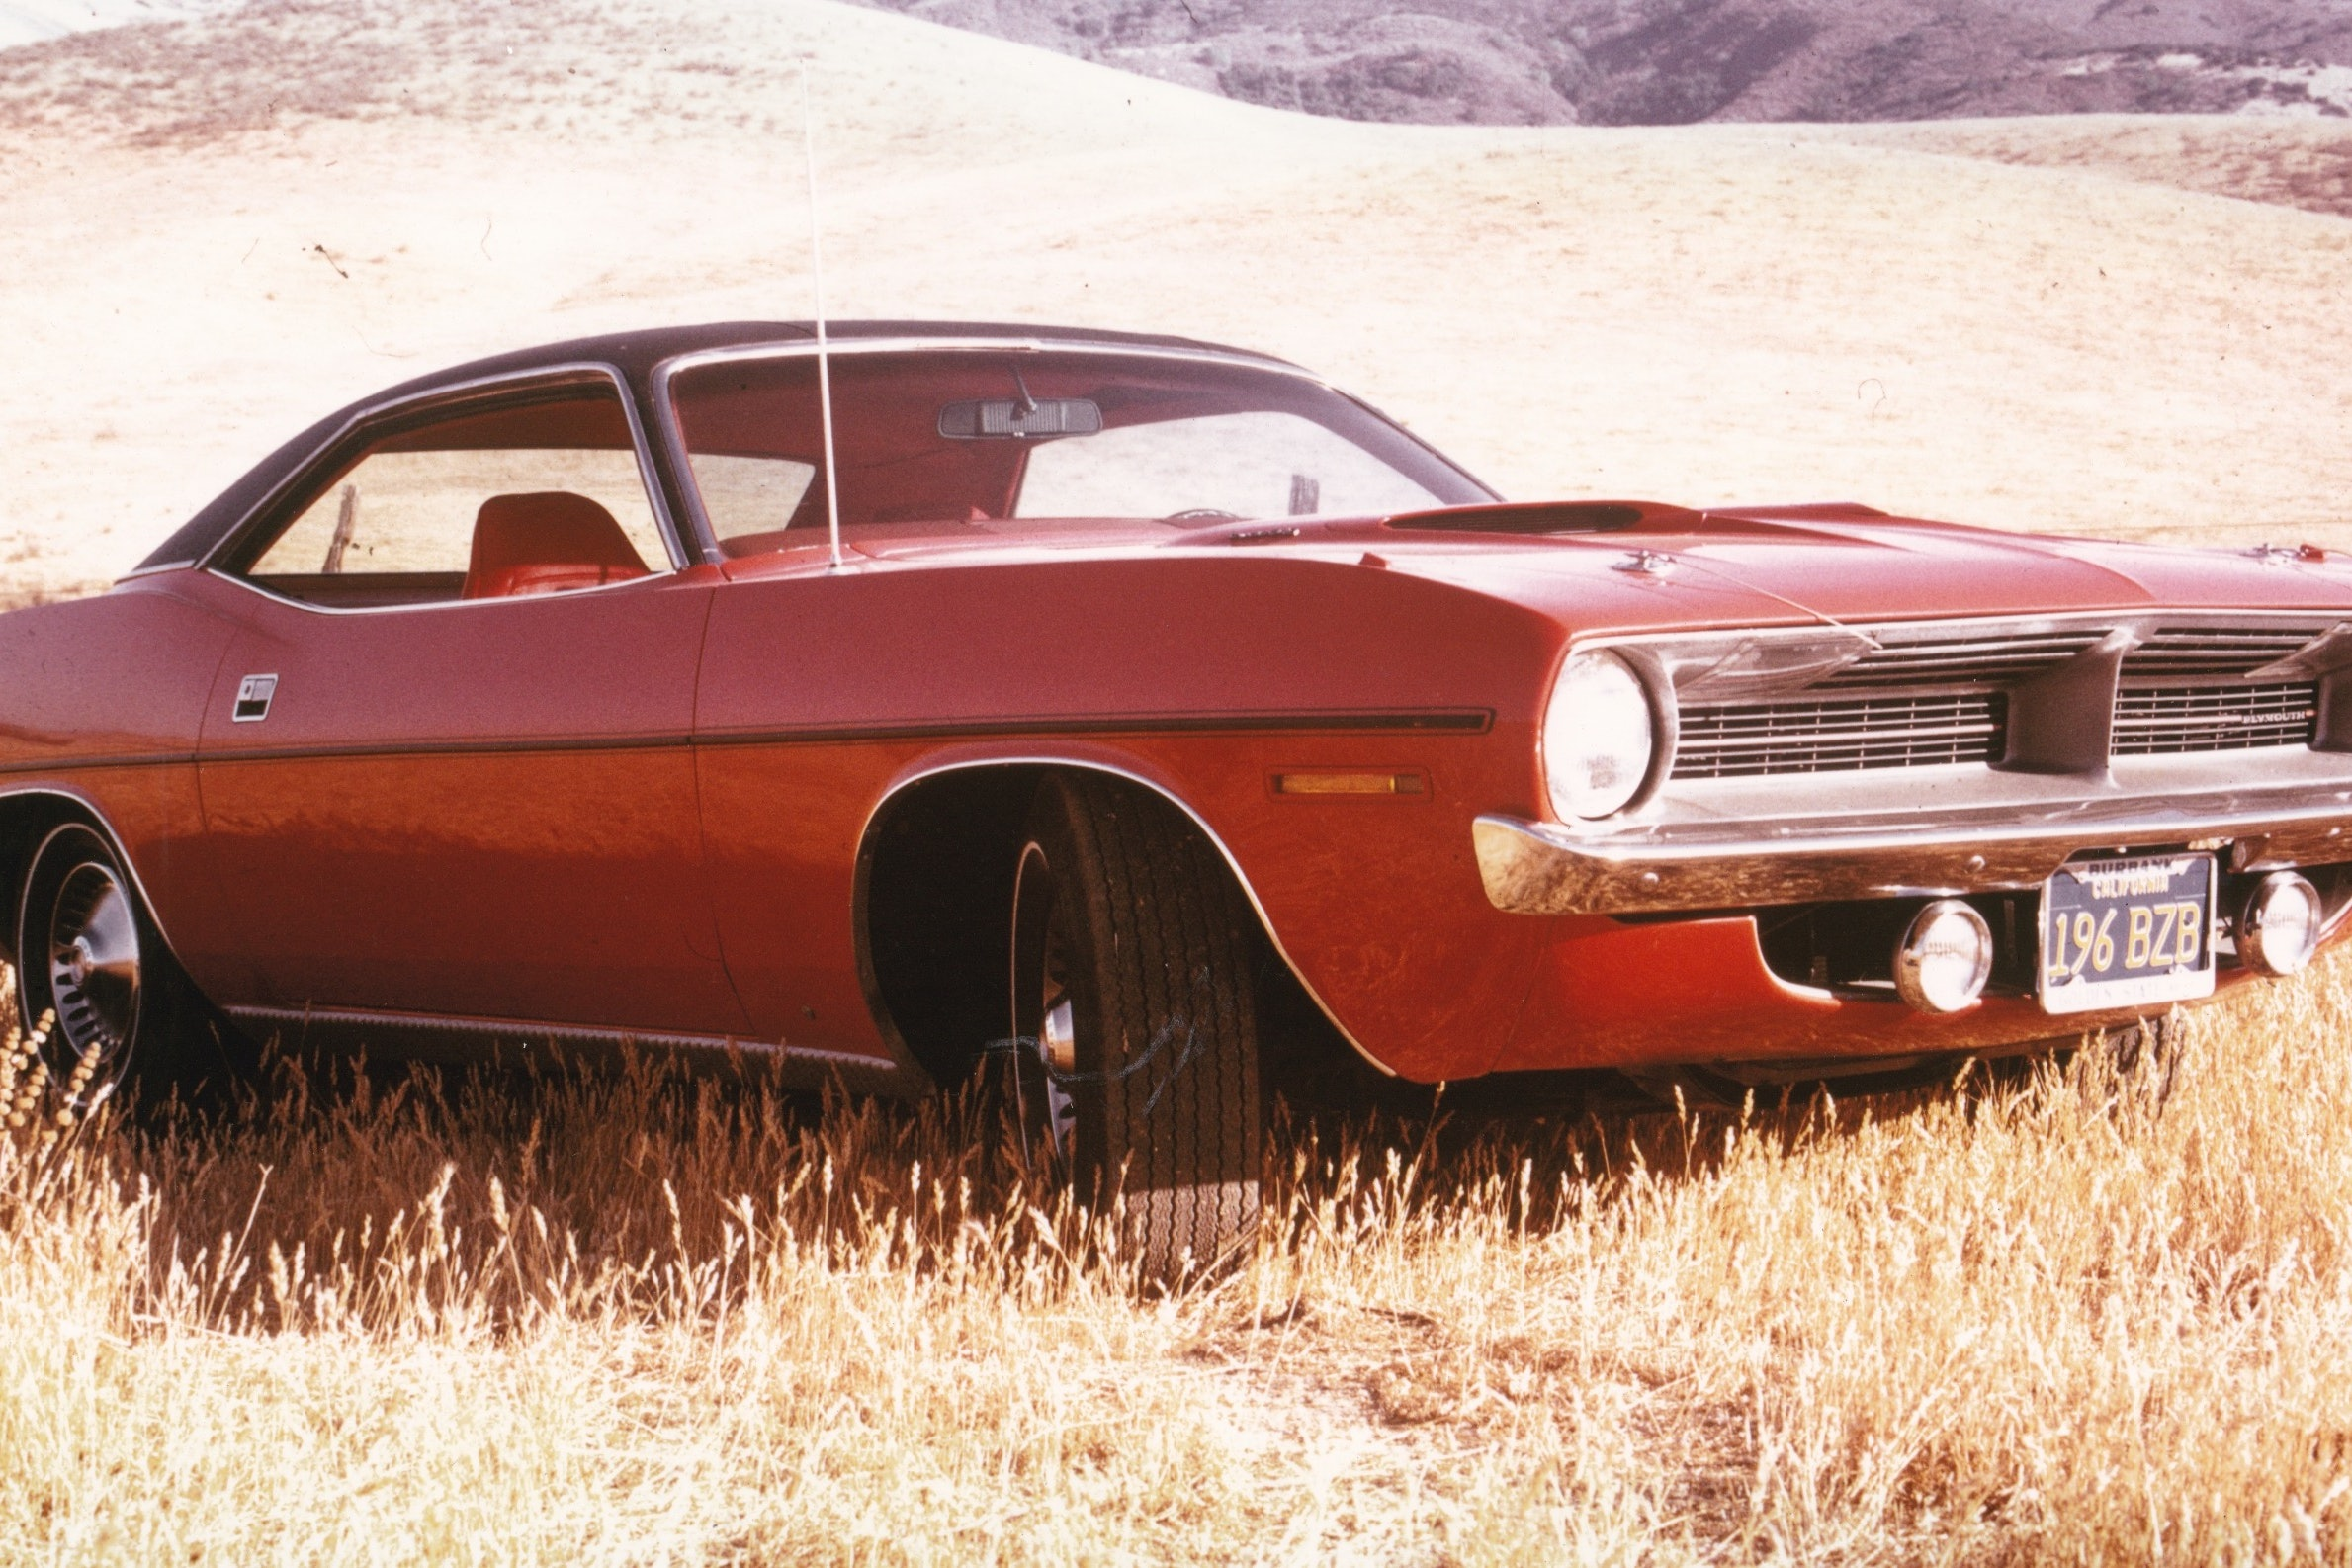 1970 Barracuda 340 Cuda